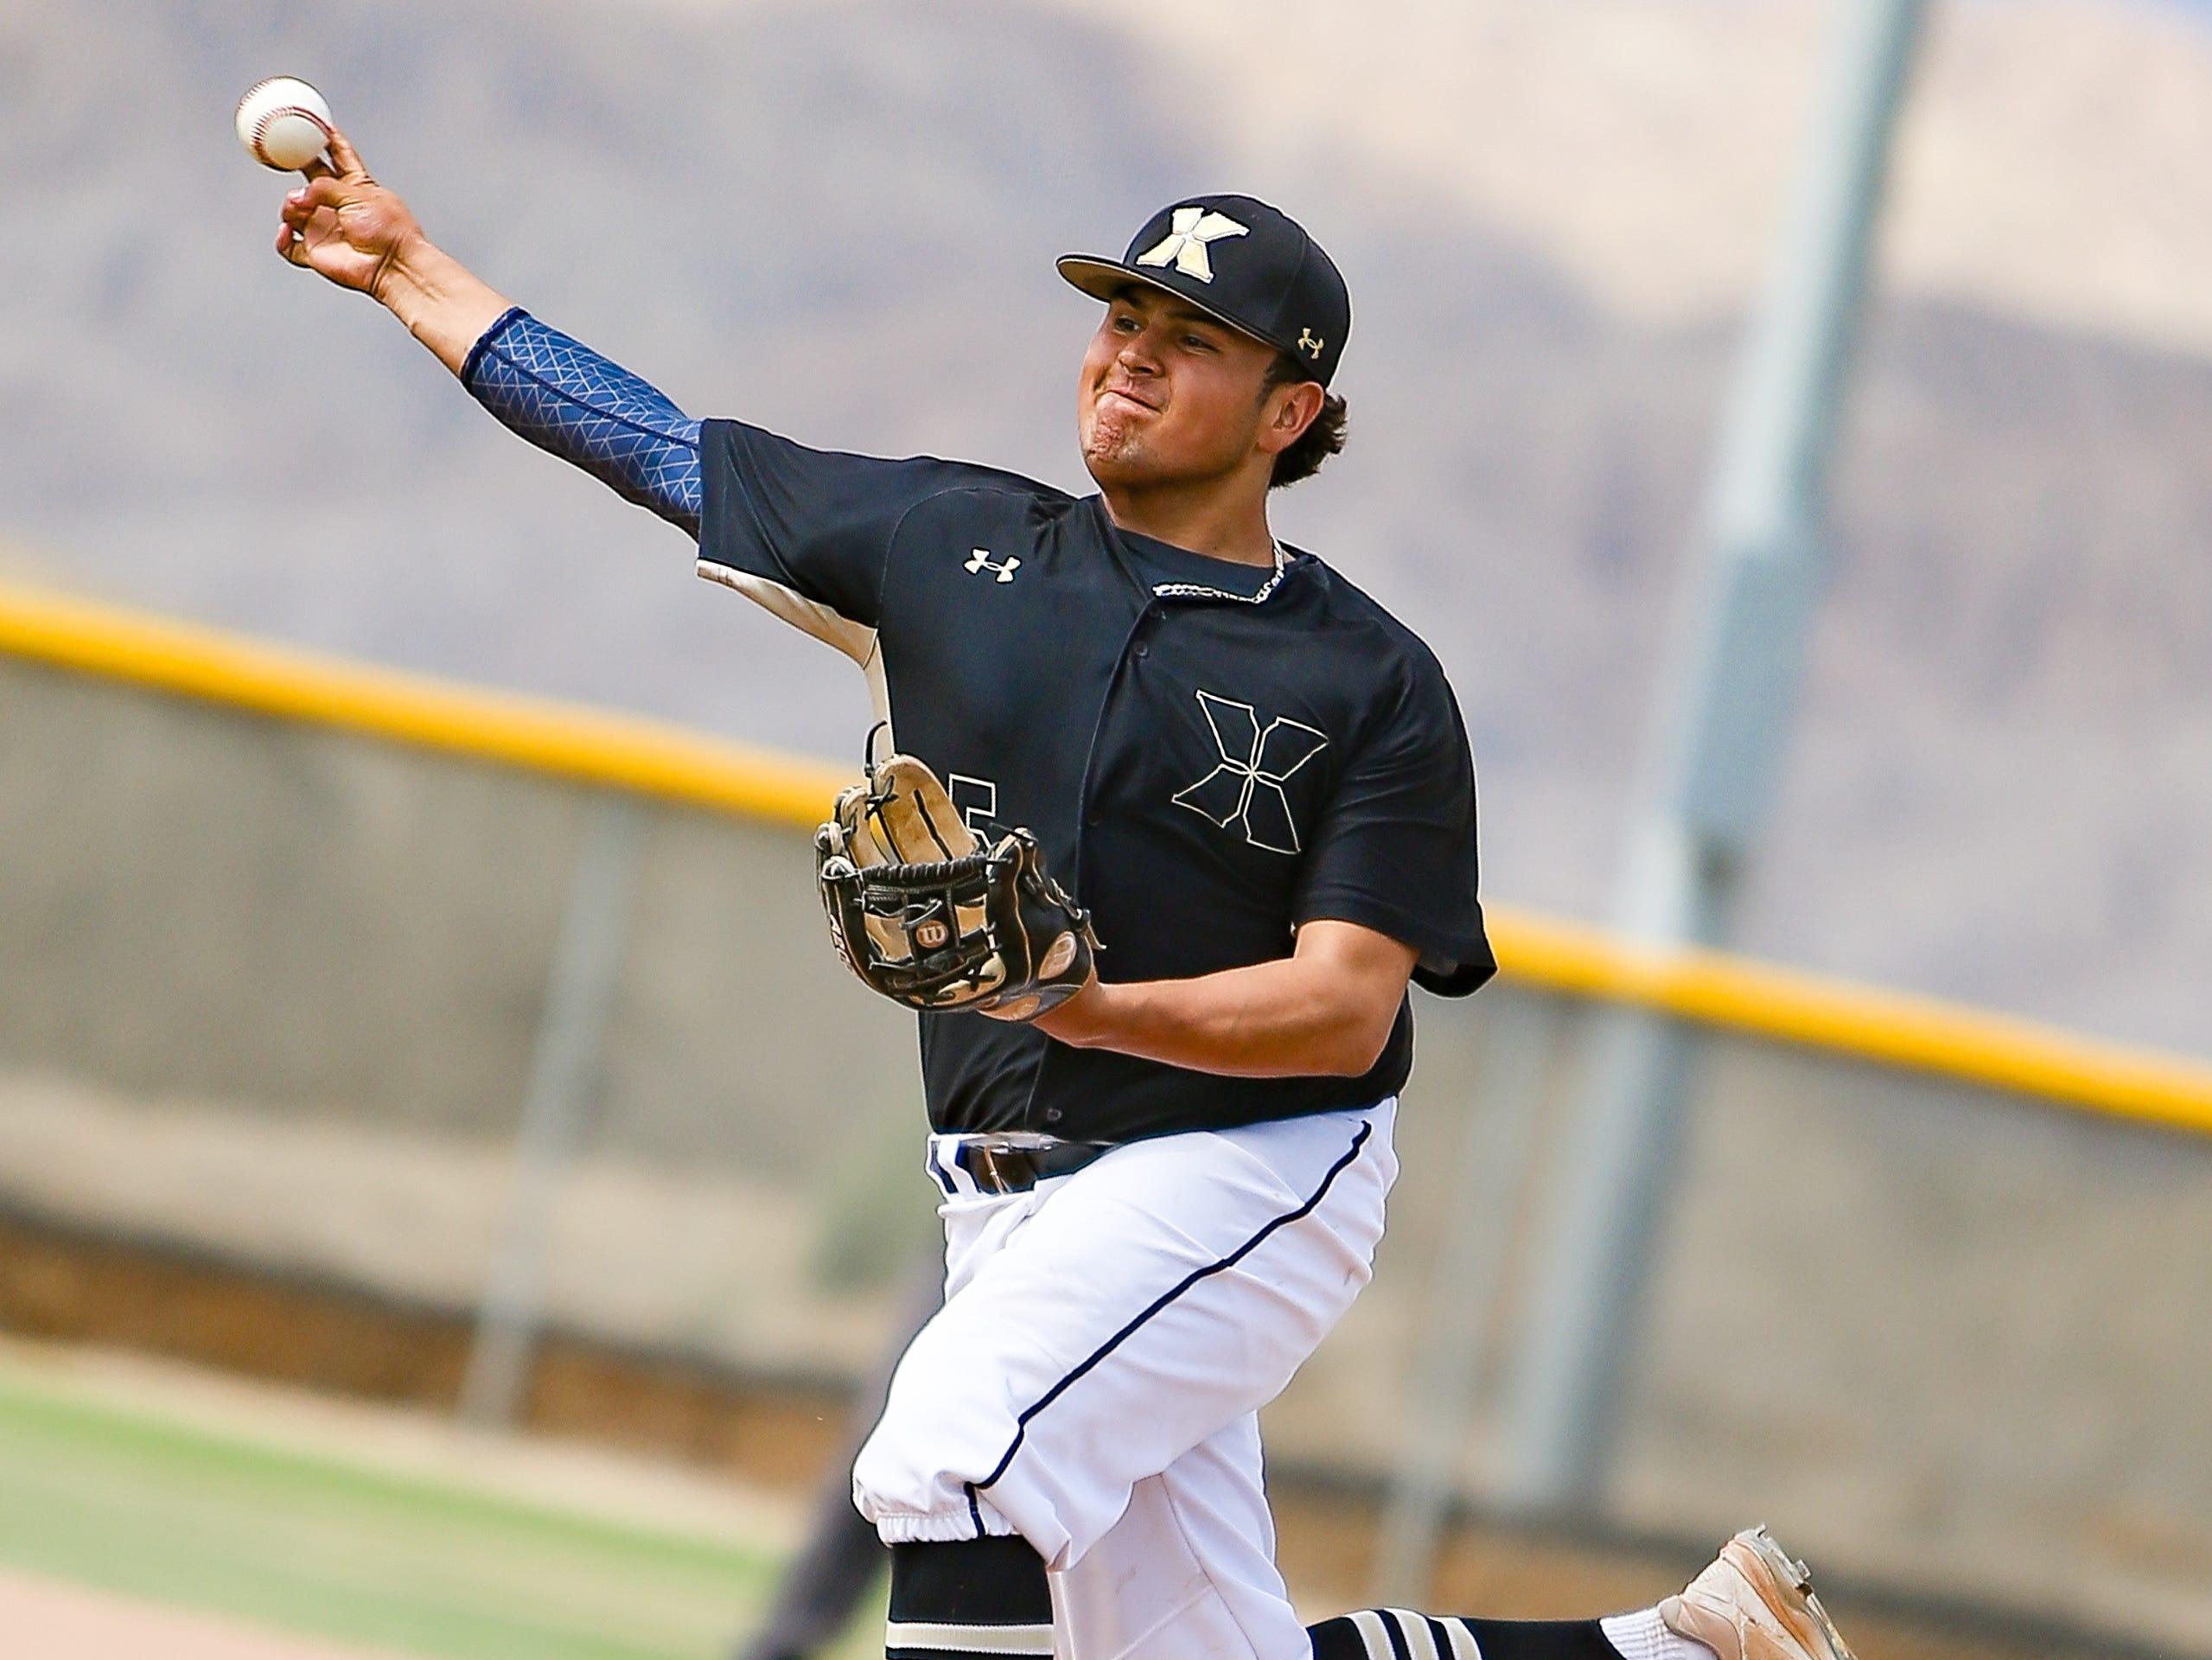 Xavier Prep starting pitcher Jordan Ruiz got the win in the Saints' 5-4 quarterfinal win over Century on Friday.